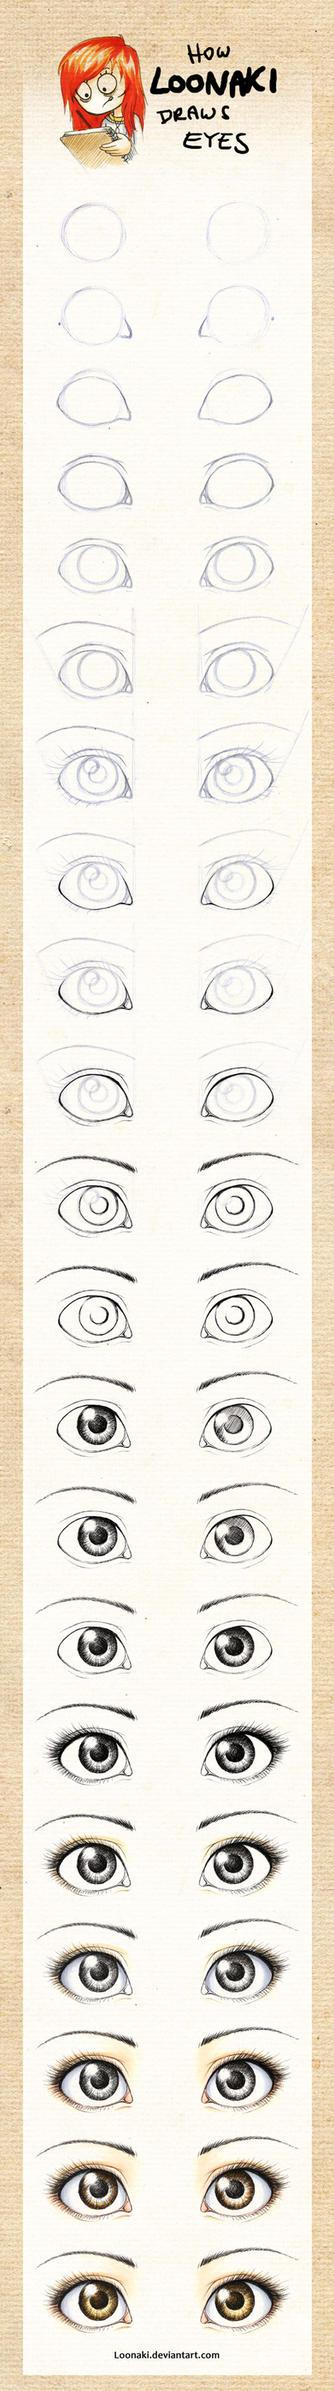 How Loonaki Draws Eyes by Loonaki